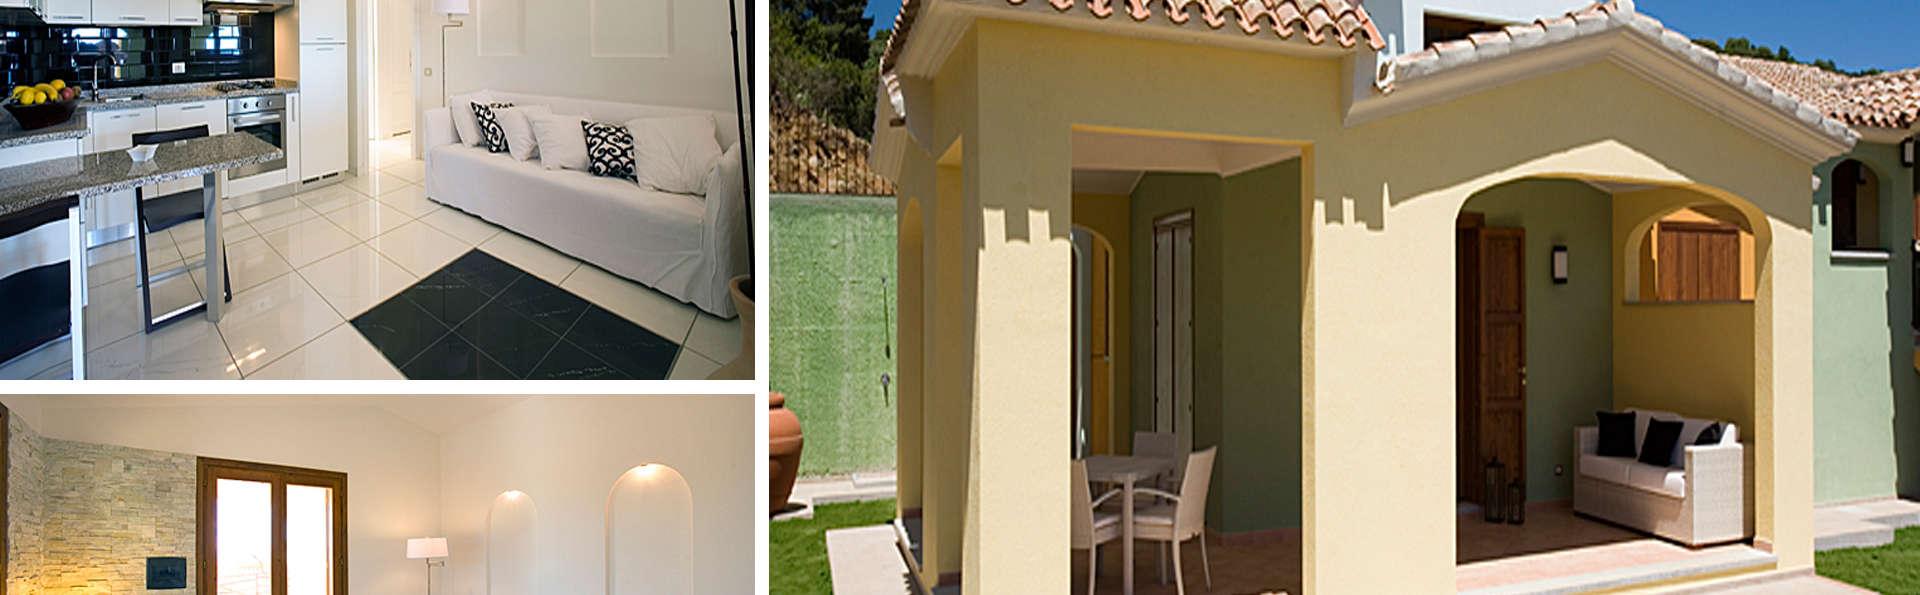 Residenze Le Verande - EDIT_collage6.jpg